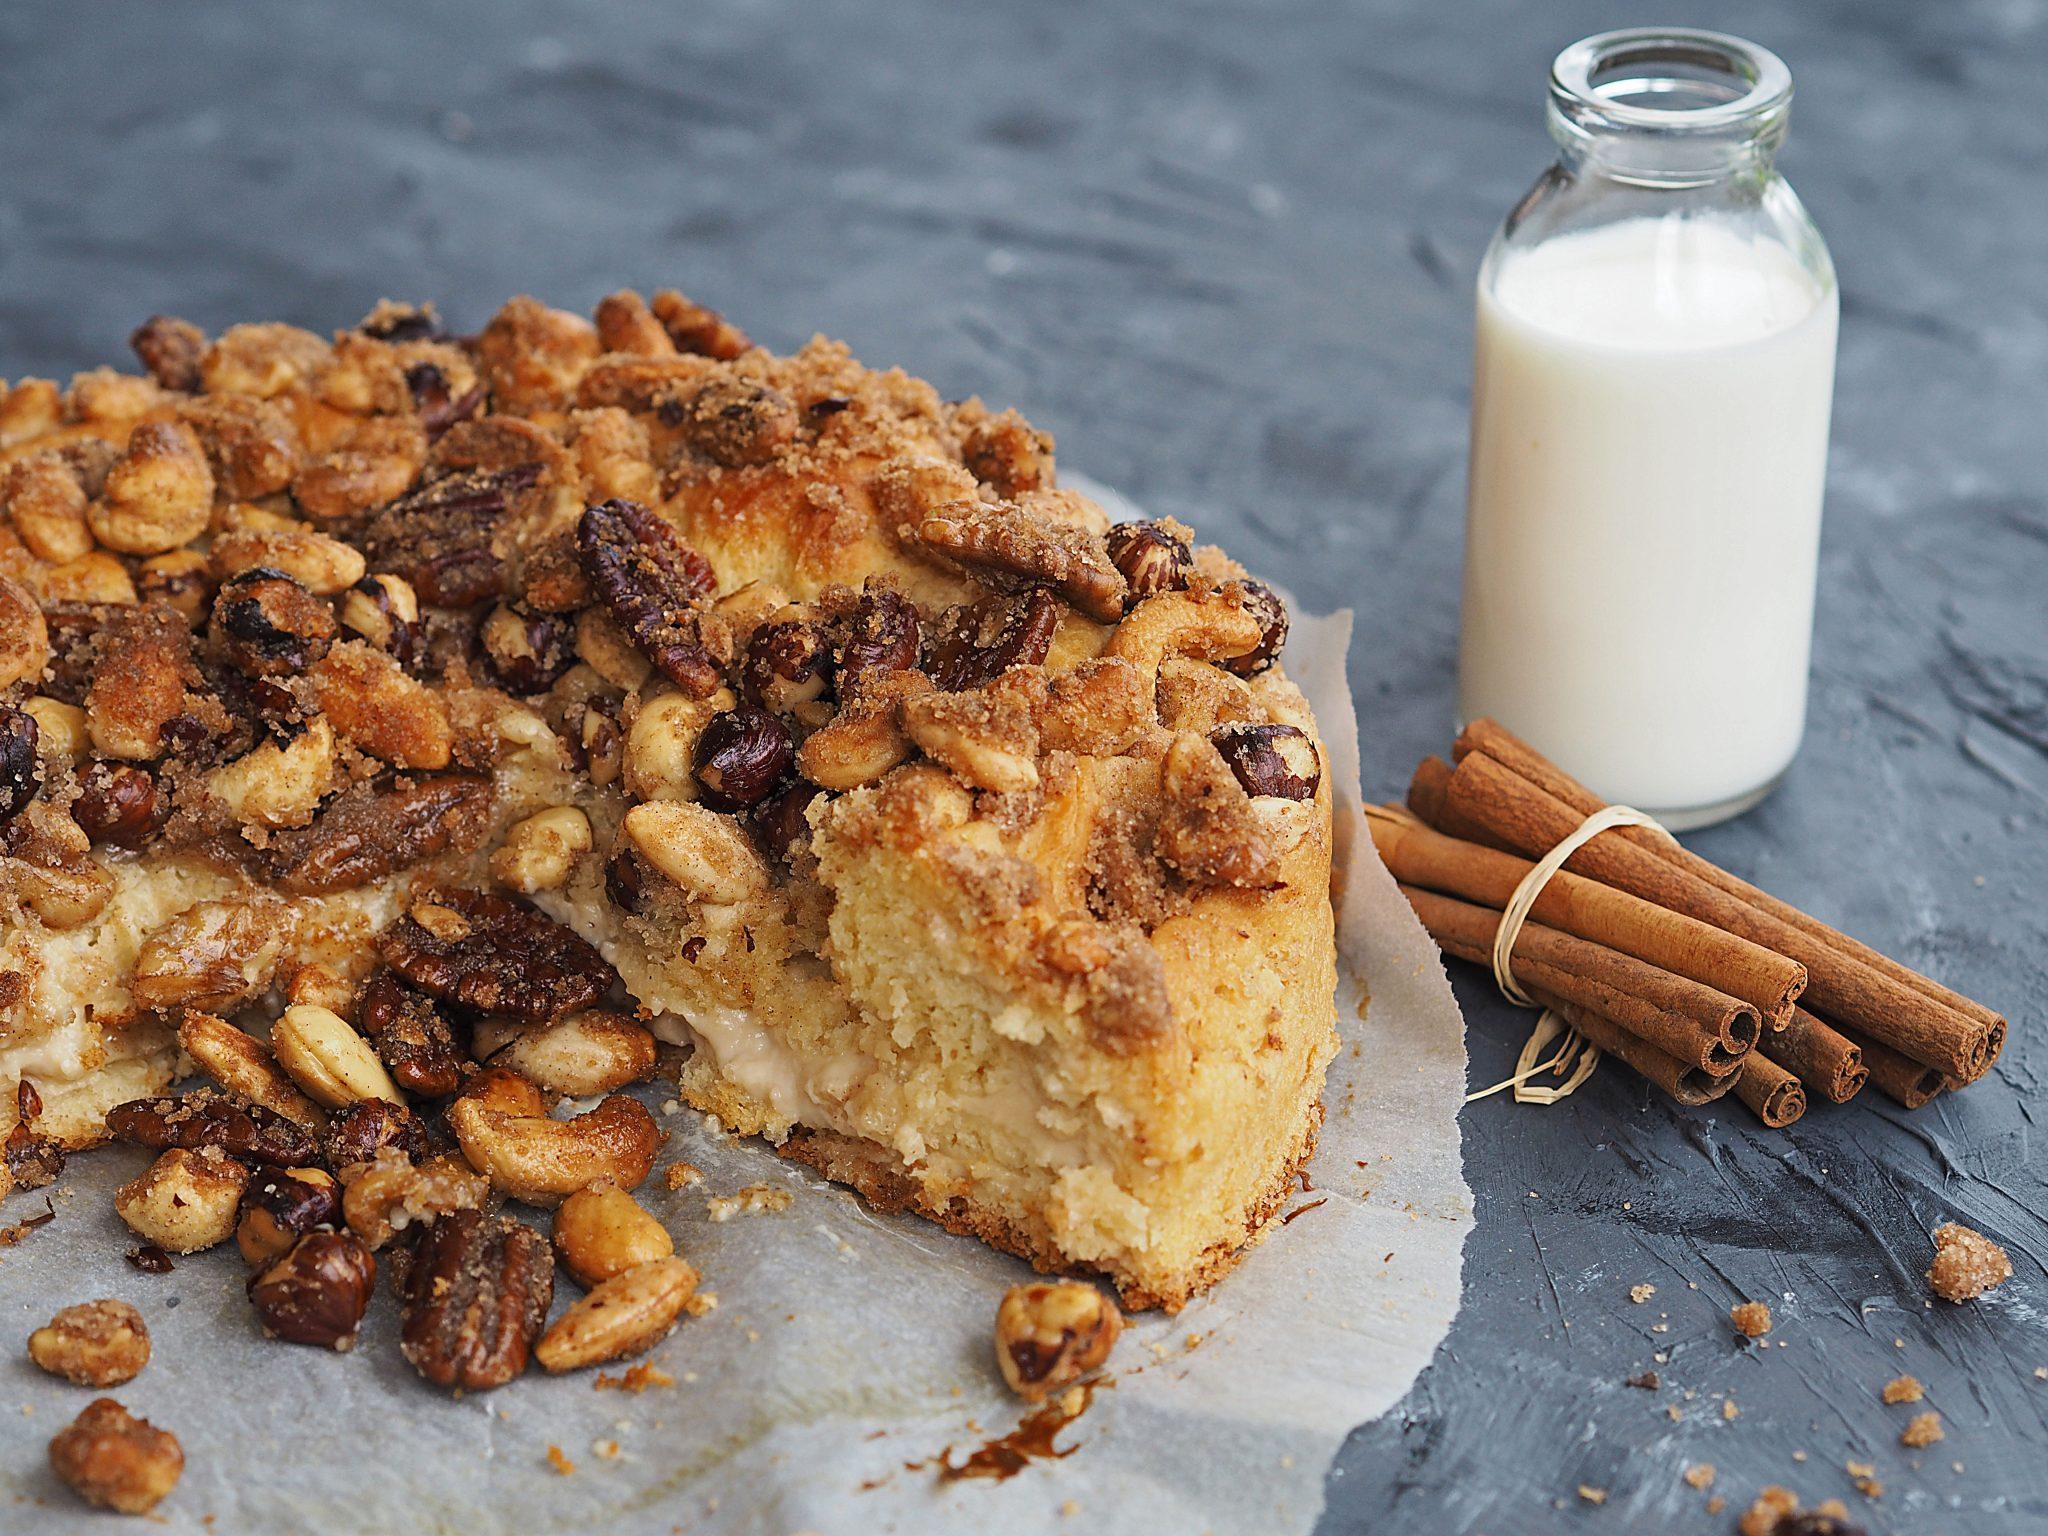 Kuchen mit Puddingfüllung